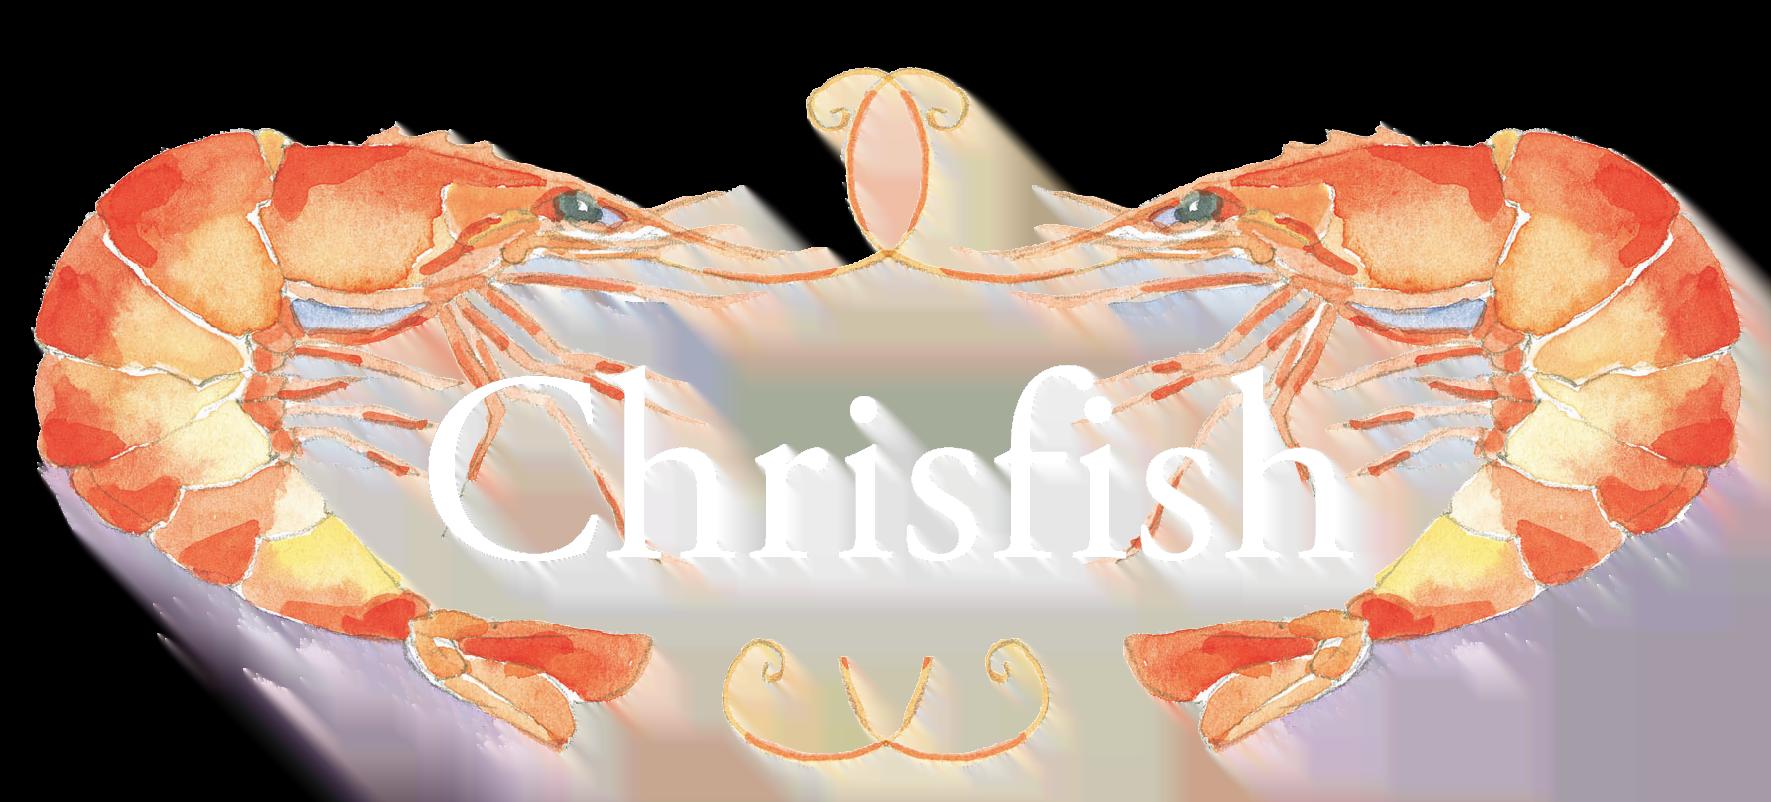 https://www.podi.dk/wp-content/uploads/2021/02/Chrisfish_samletlogo_highres_medium-12.png